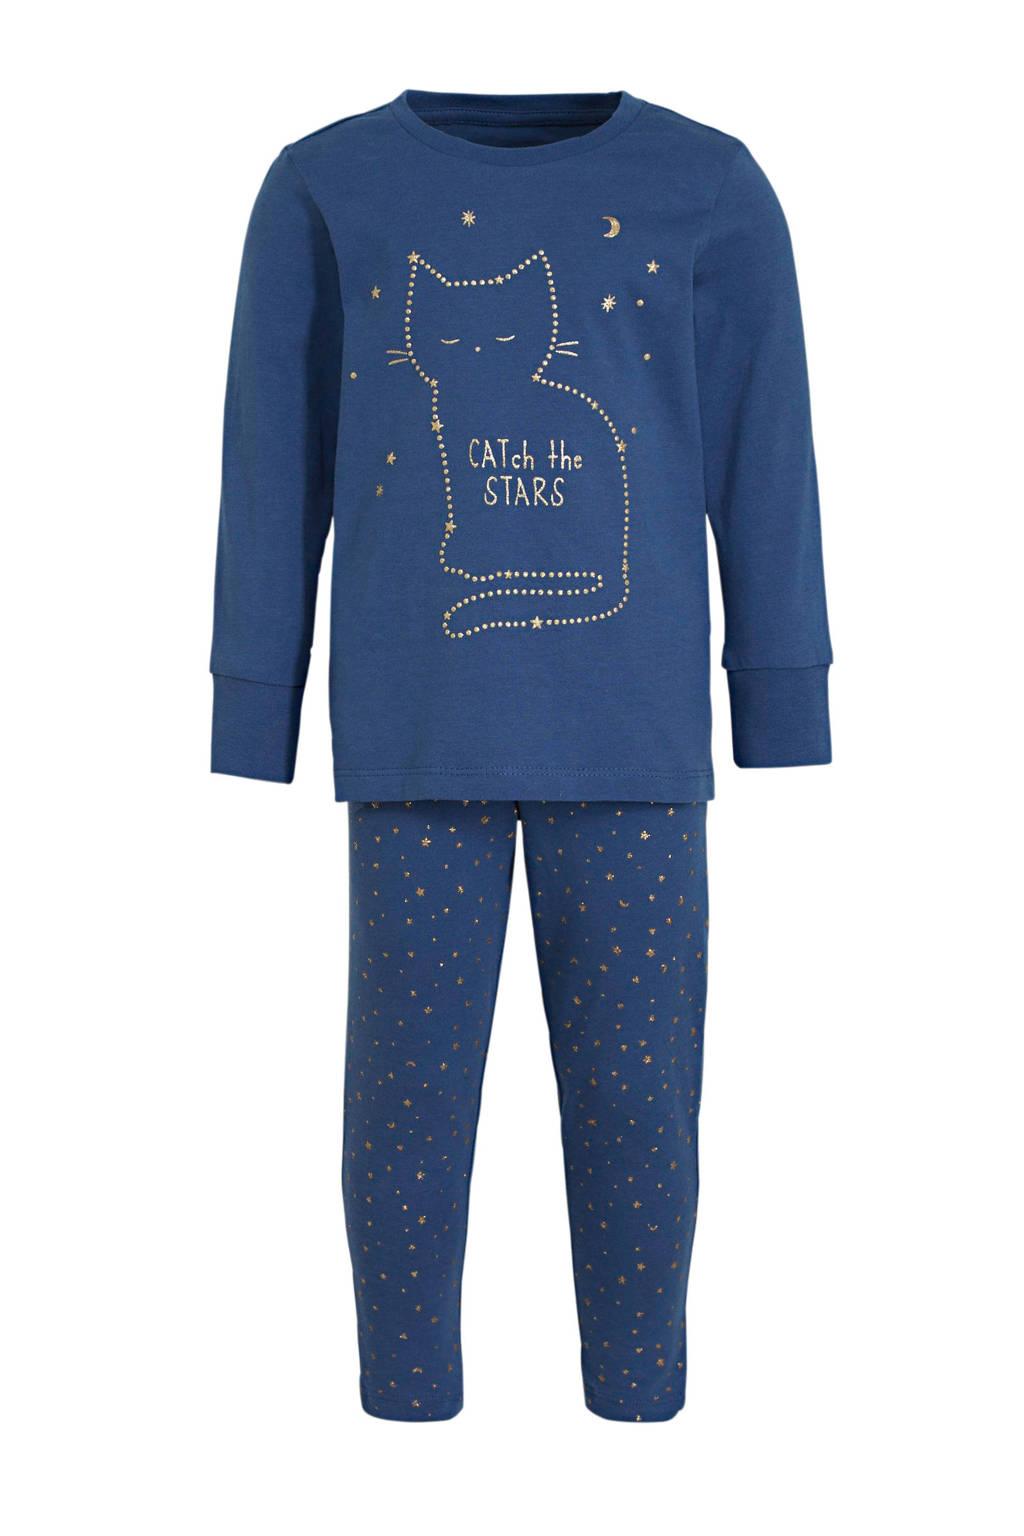 C&A Palomino pyjama printopdruk blauw, Blauw